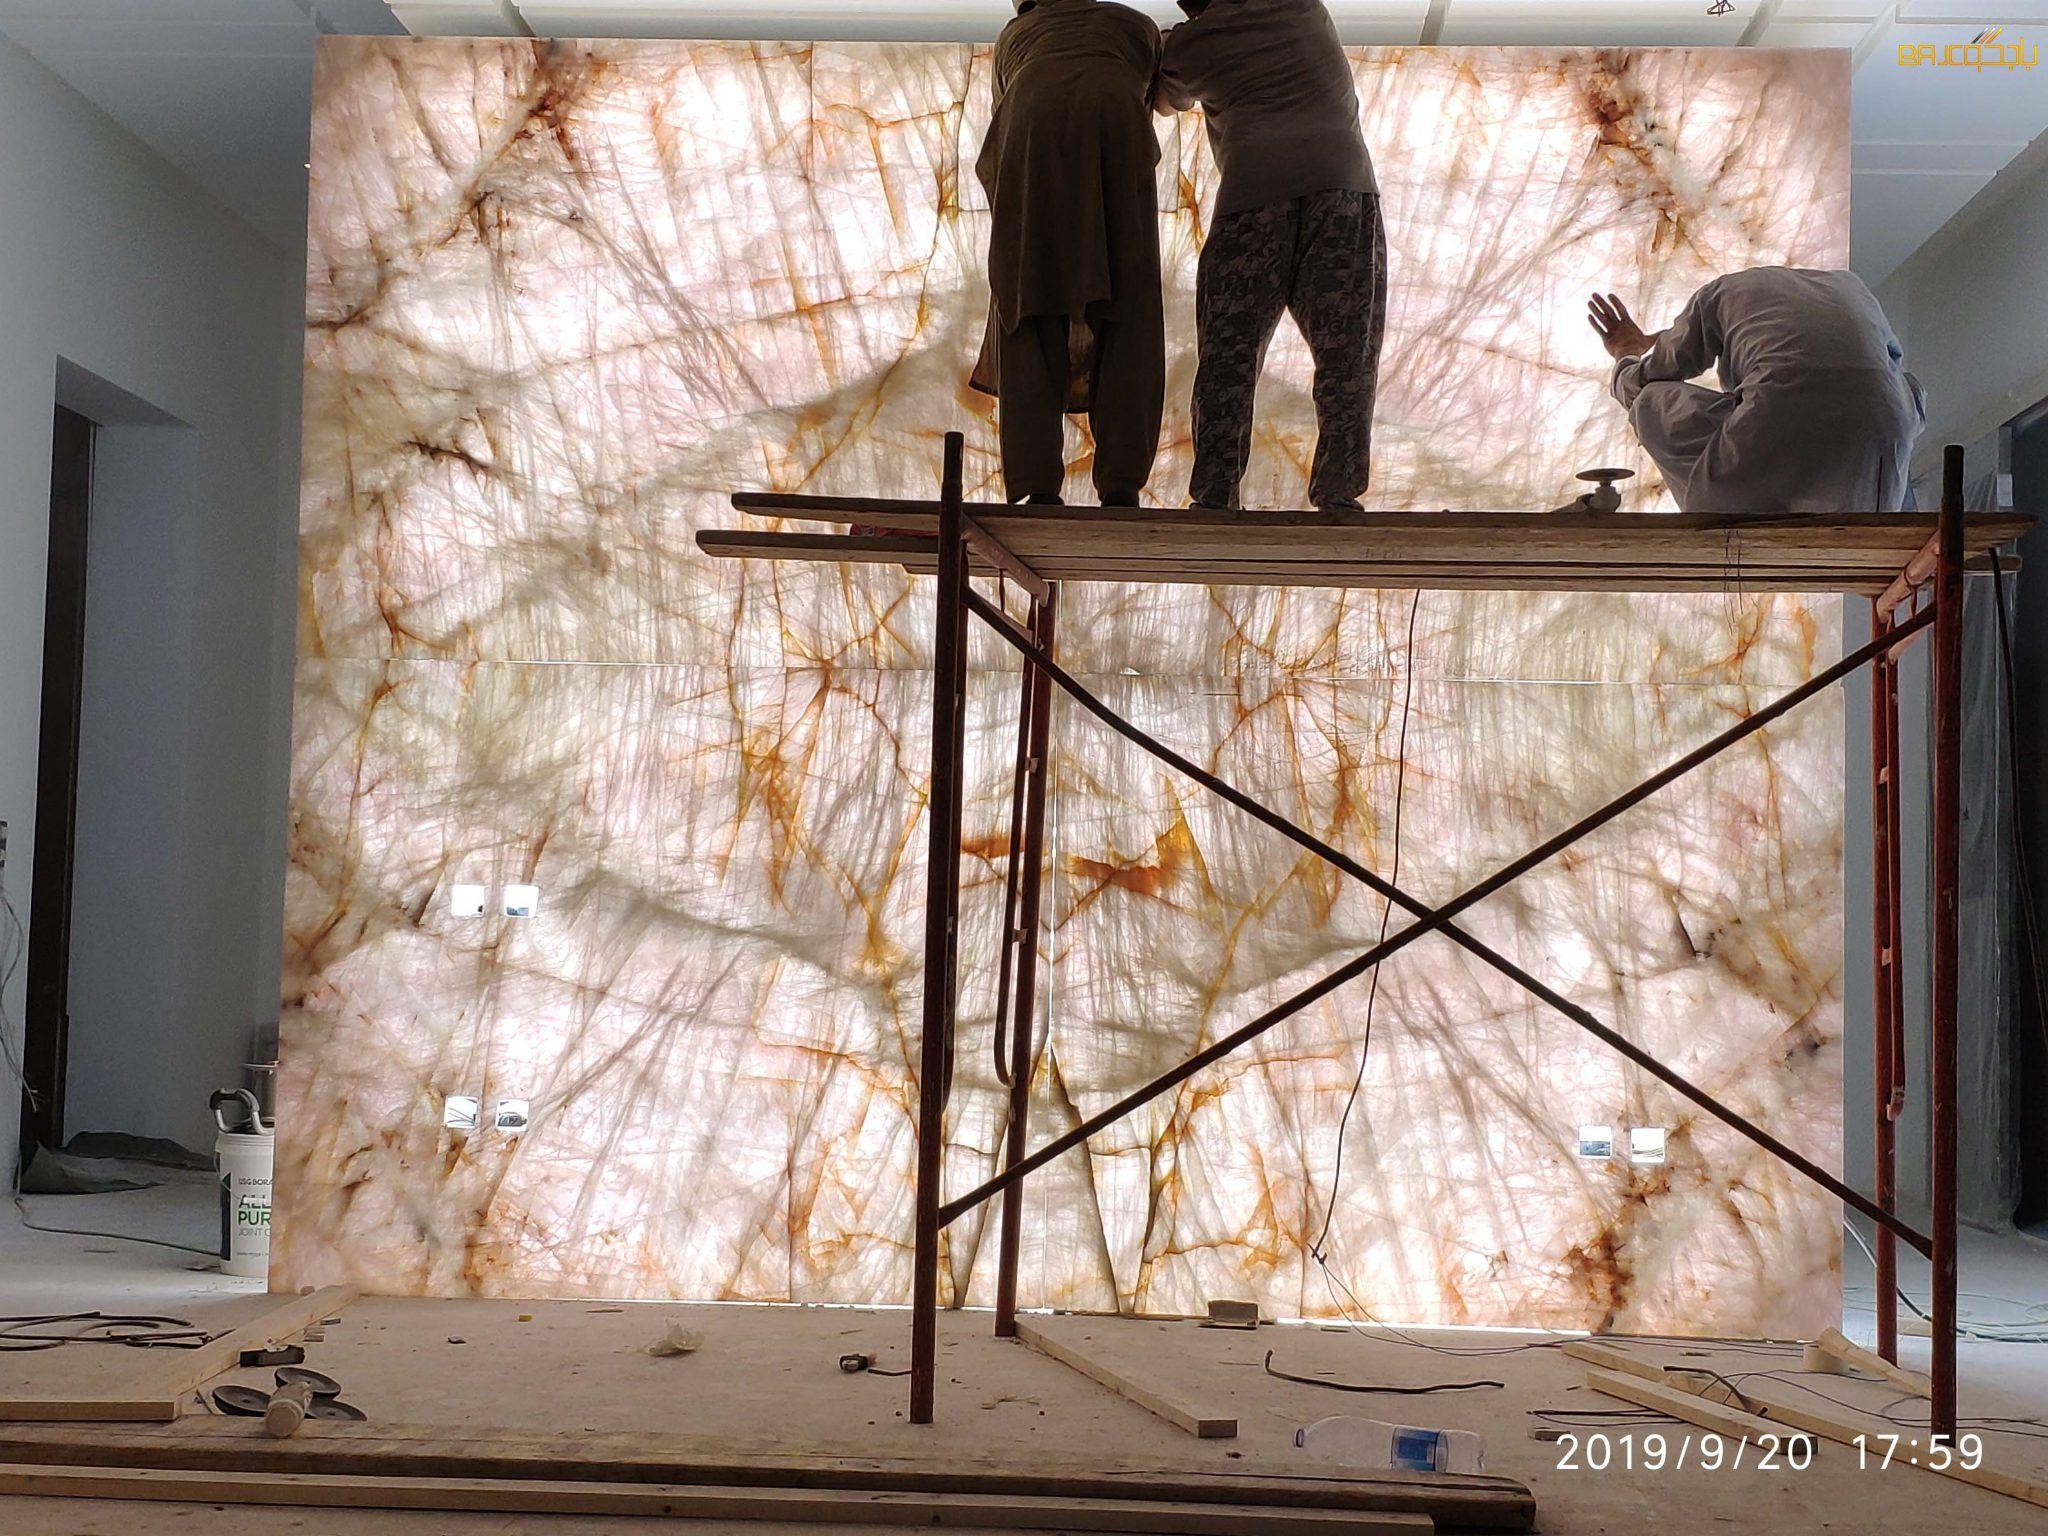 مغاسل رخام باجكو للرخام Entryway Tables Decor Marble